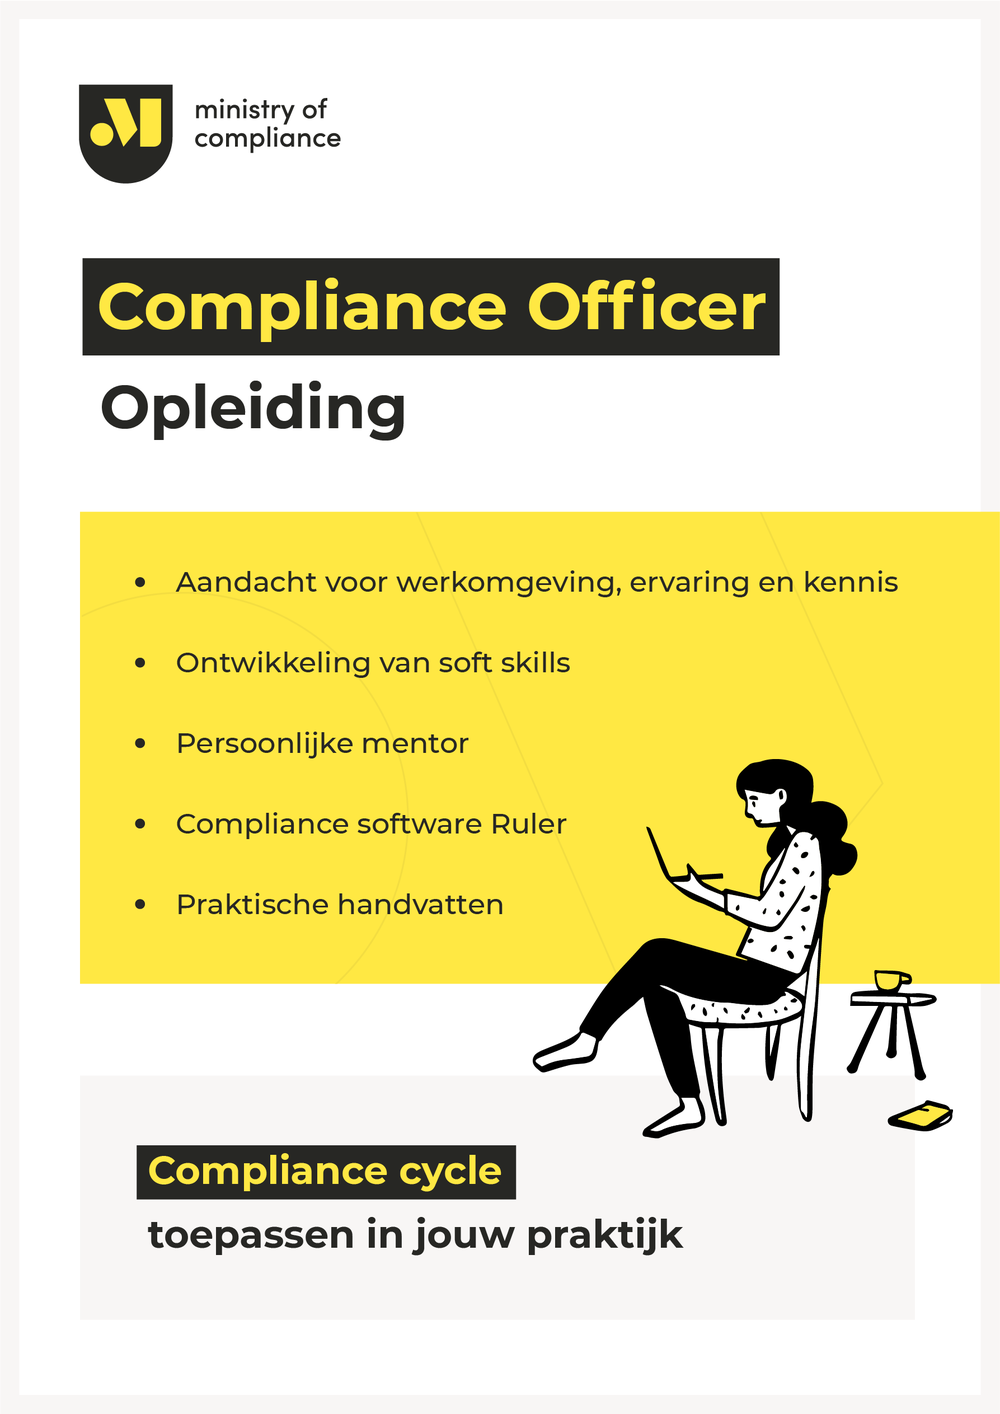 MoC_ComplianceOfficer_Banner71.png